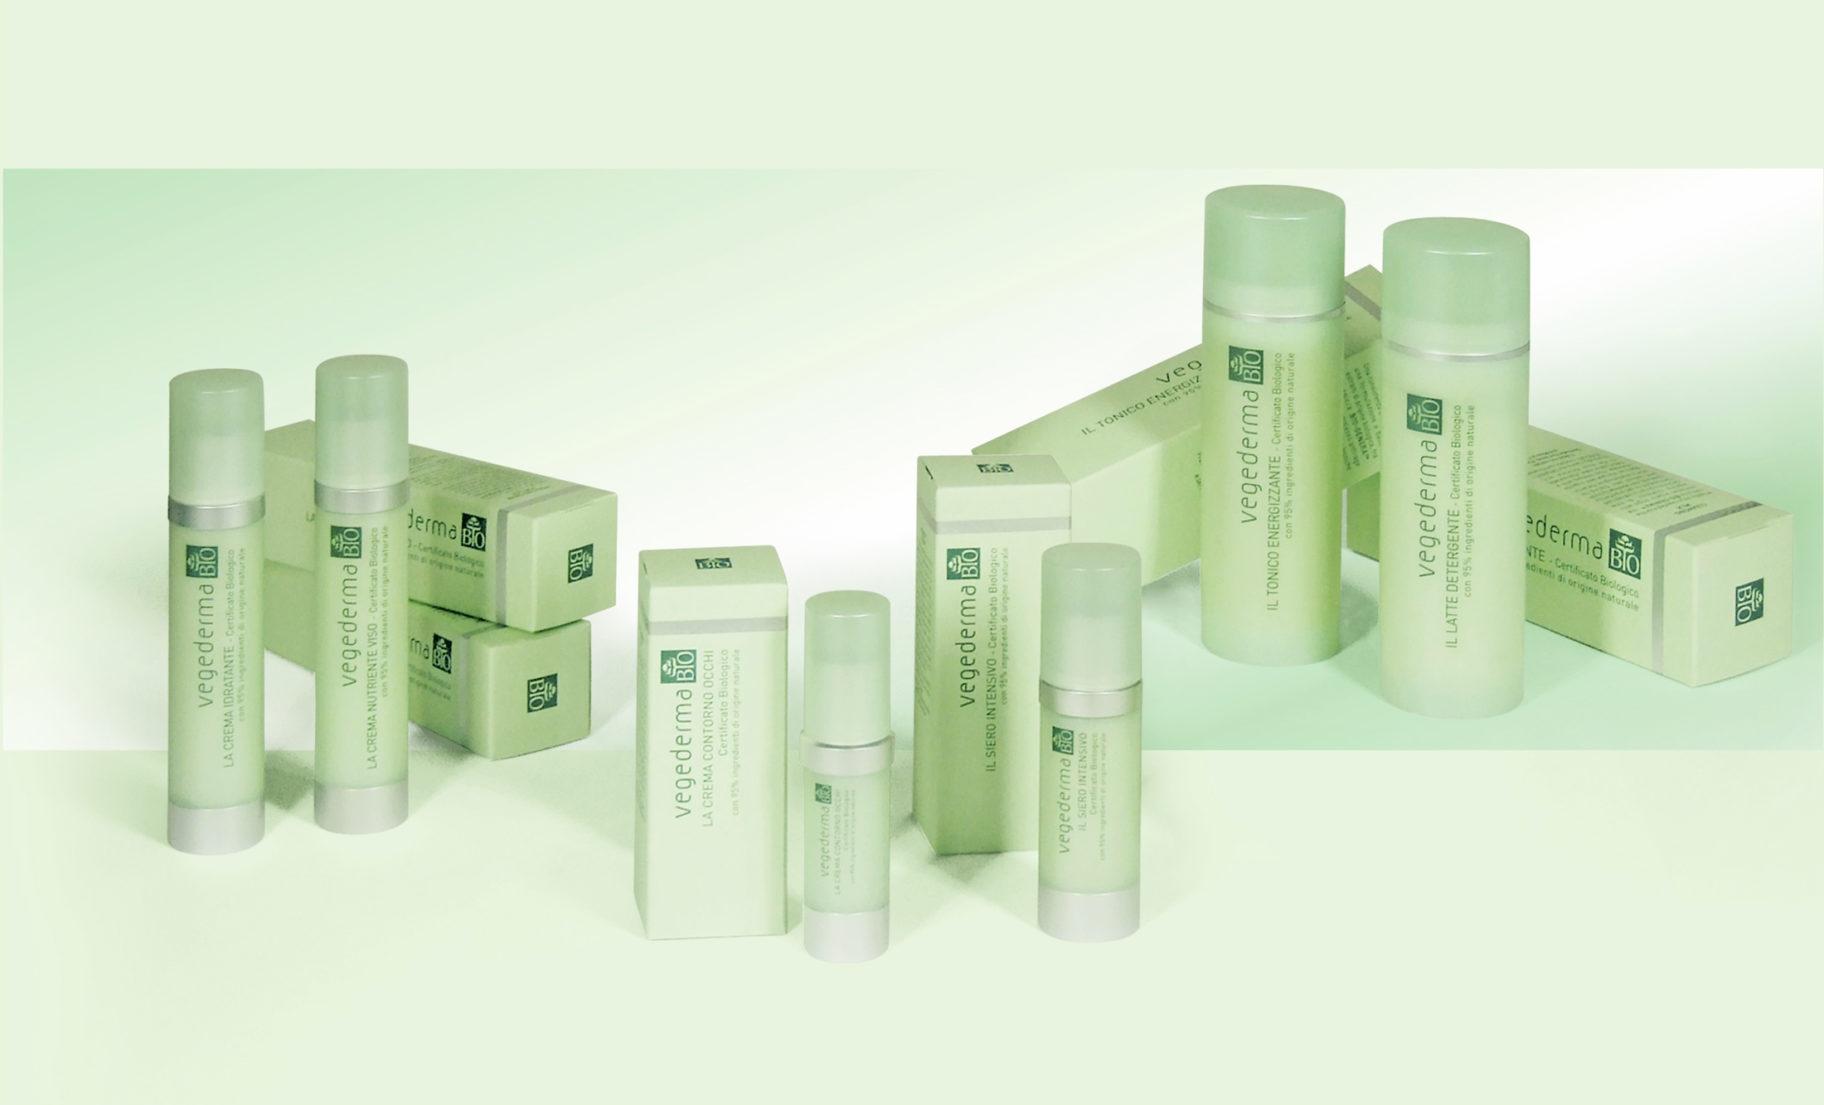 BEAUTIMPORT VegedermaBIO-prodotti-packaging